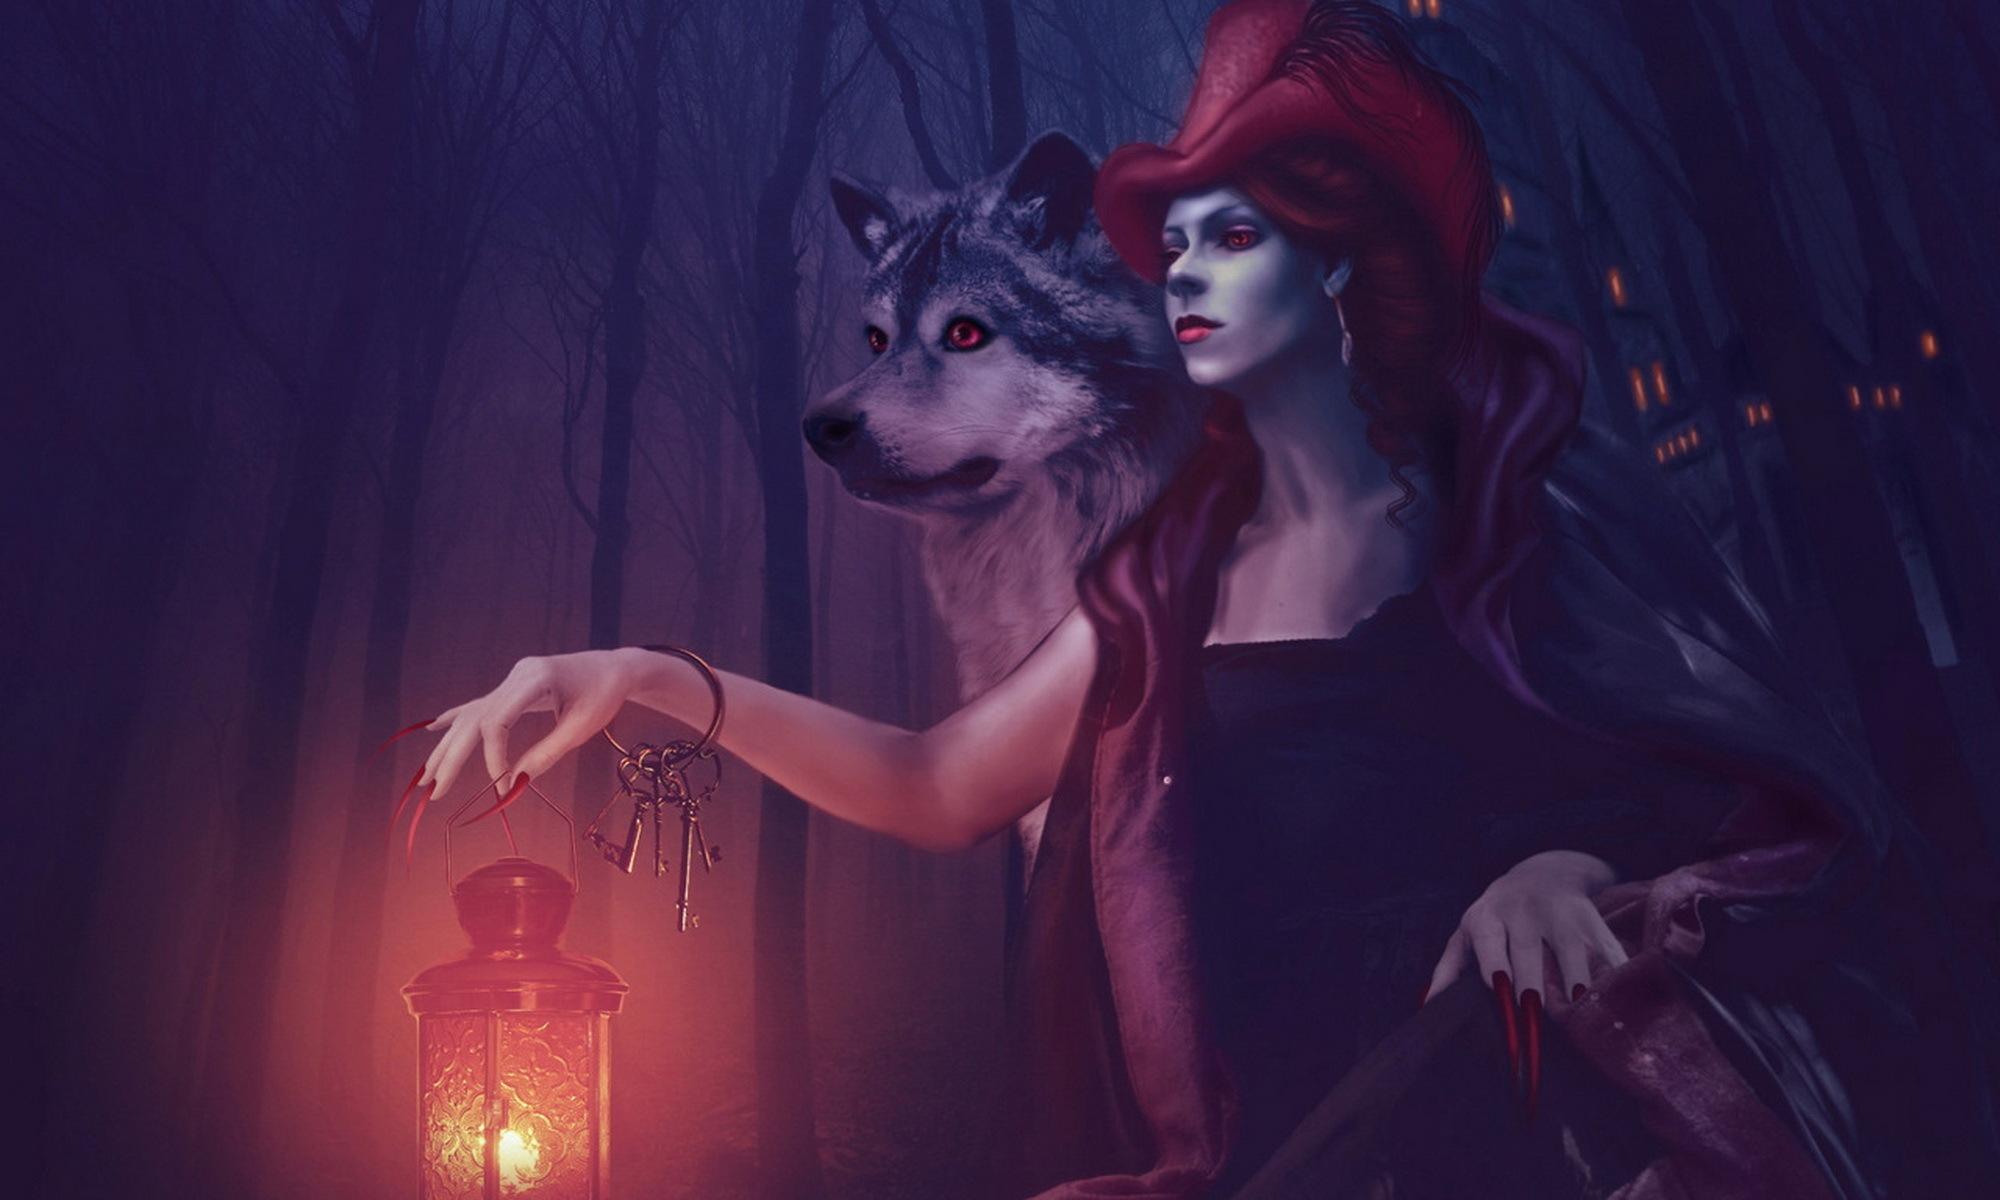 dark gothic witch wallpaper oscargilaberte com